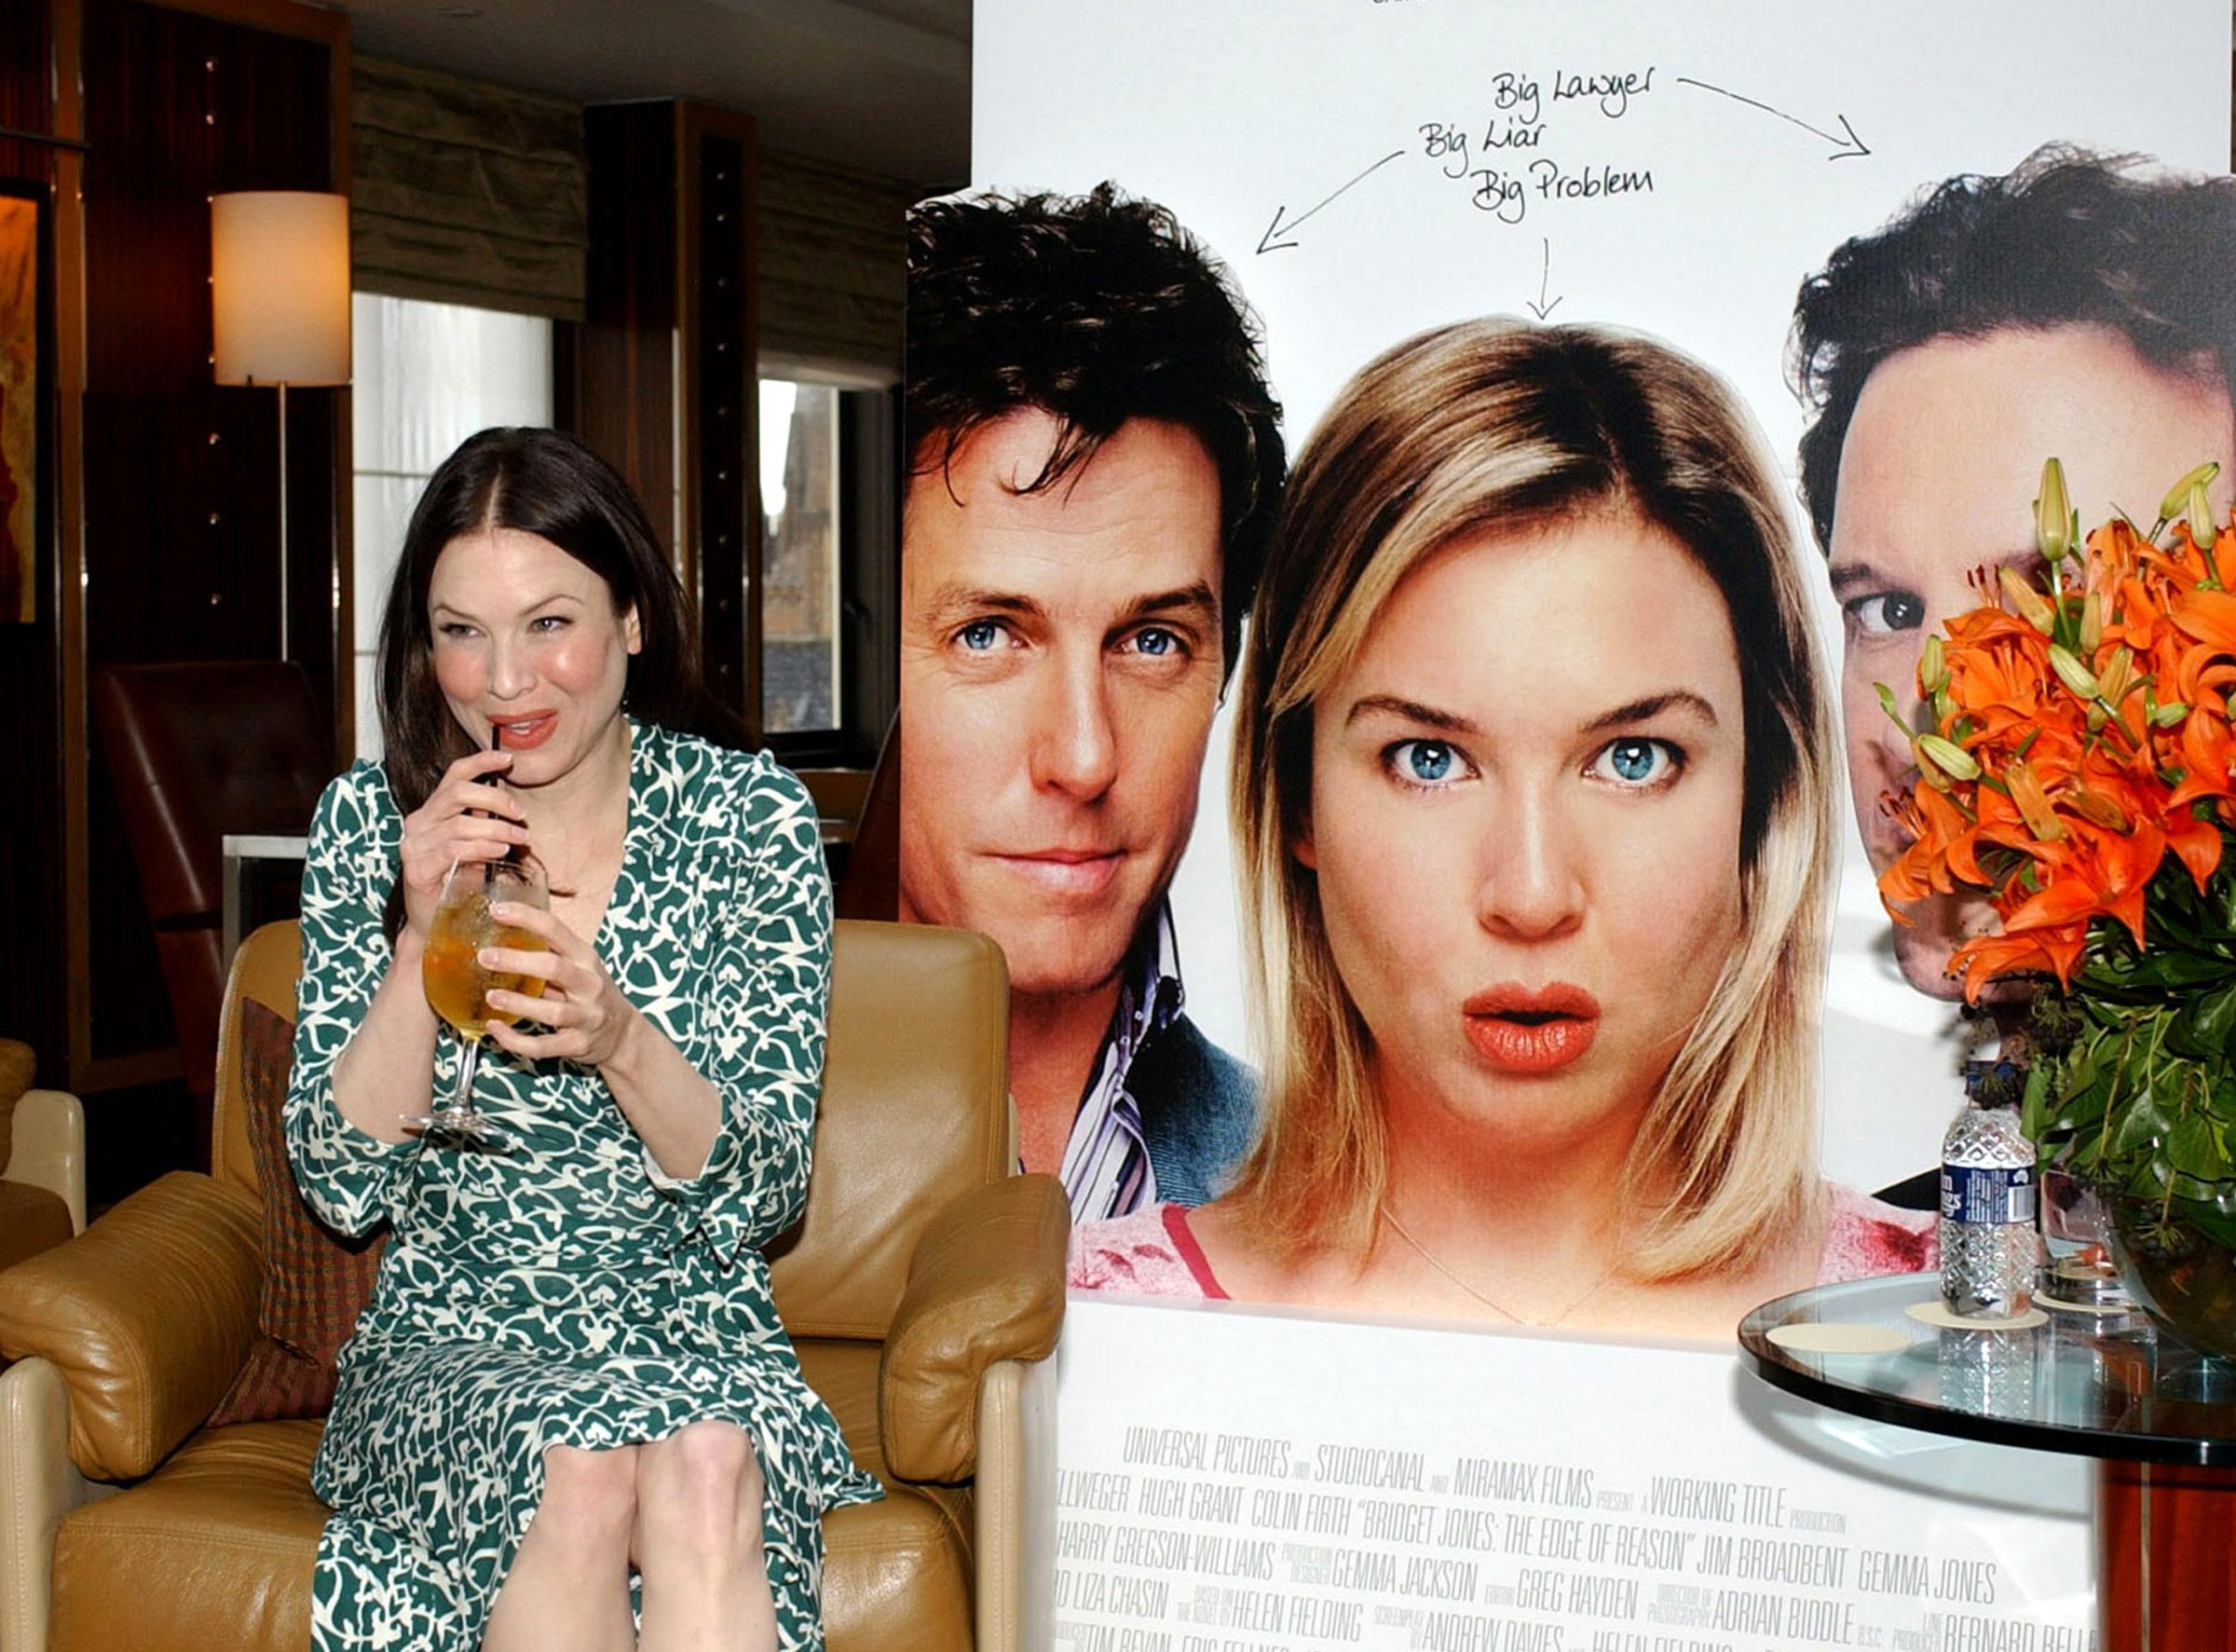 Bridget Jones, le frasi famose che l'hanno resa celebre